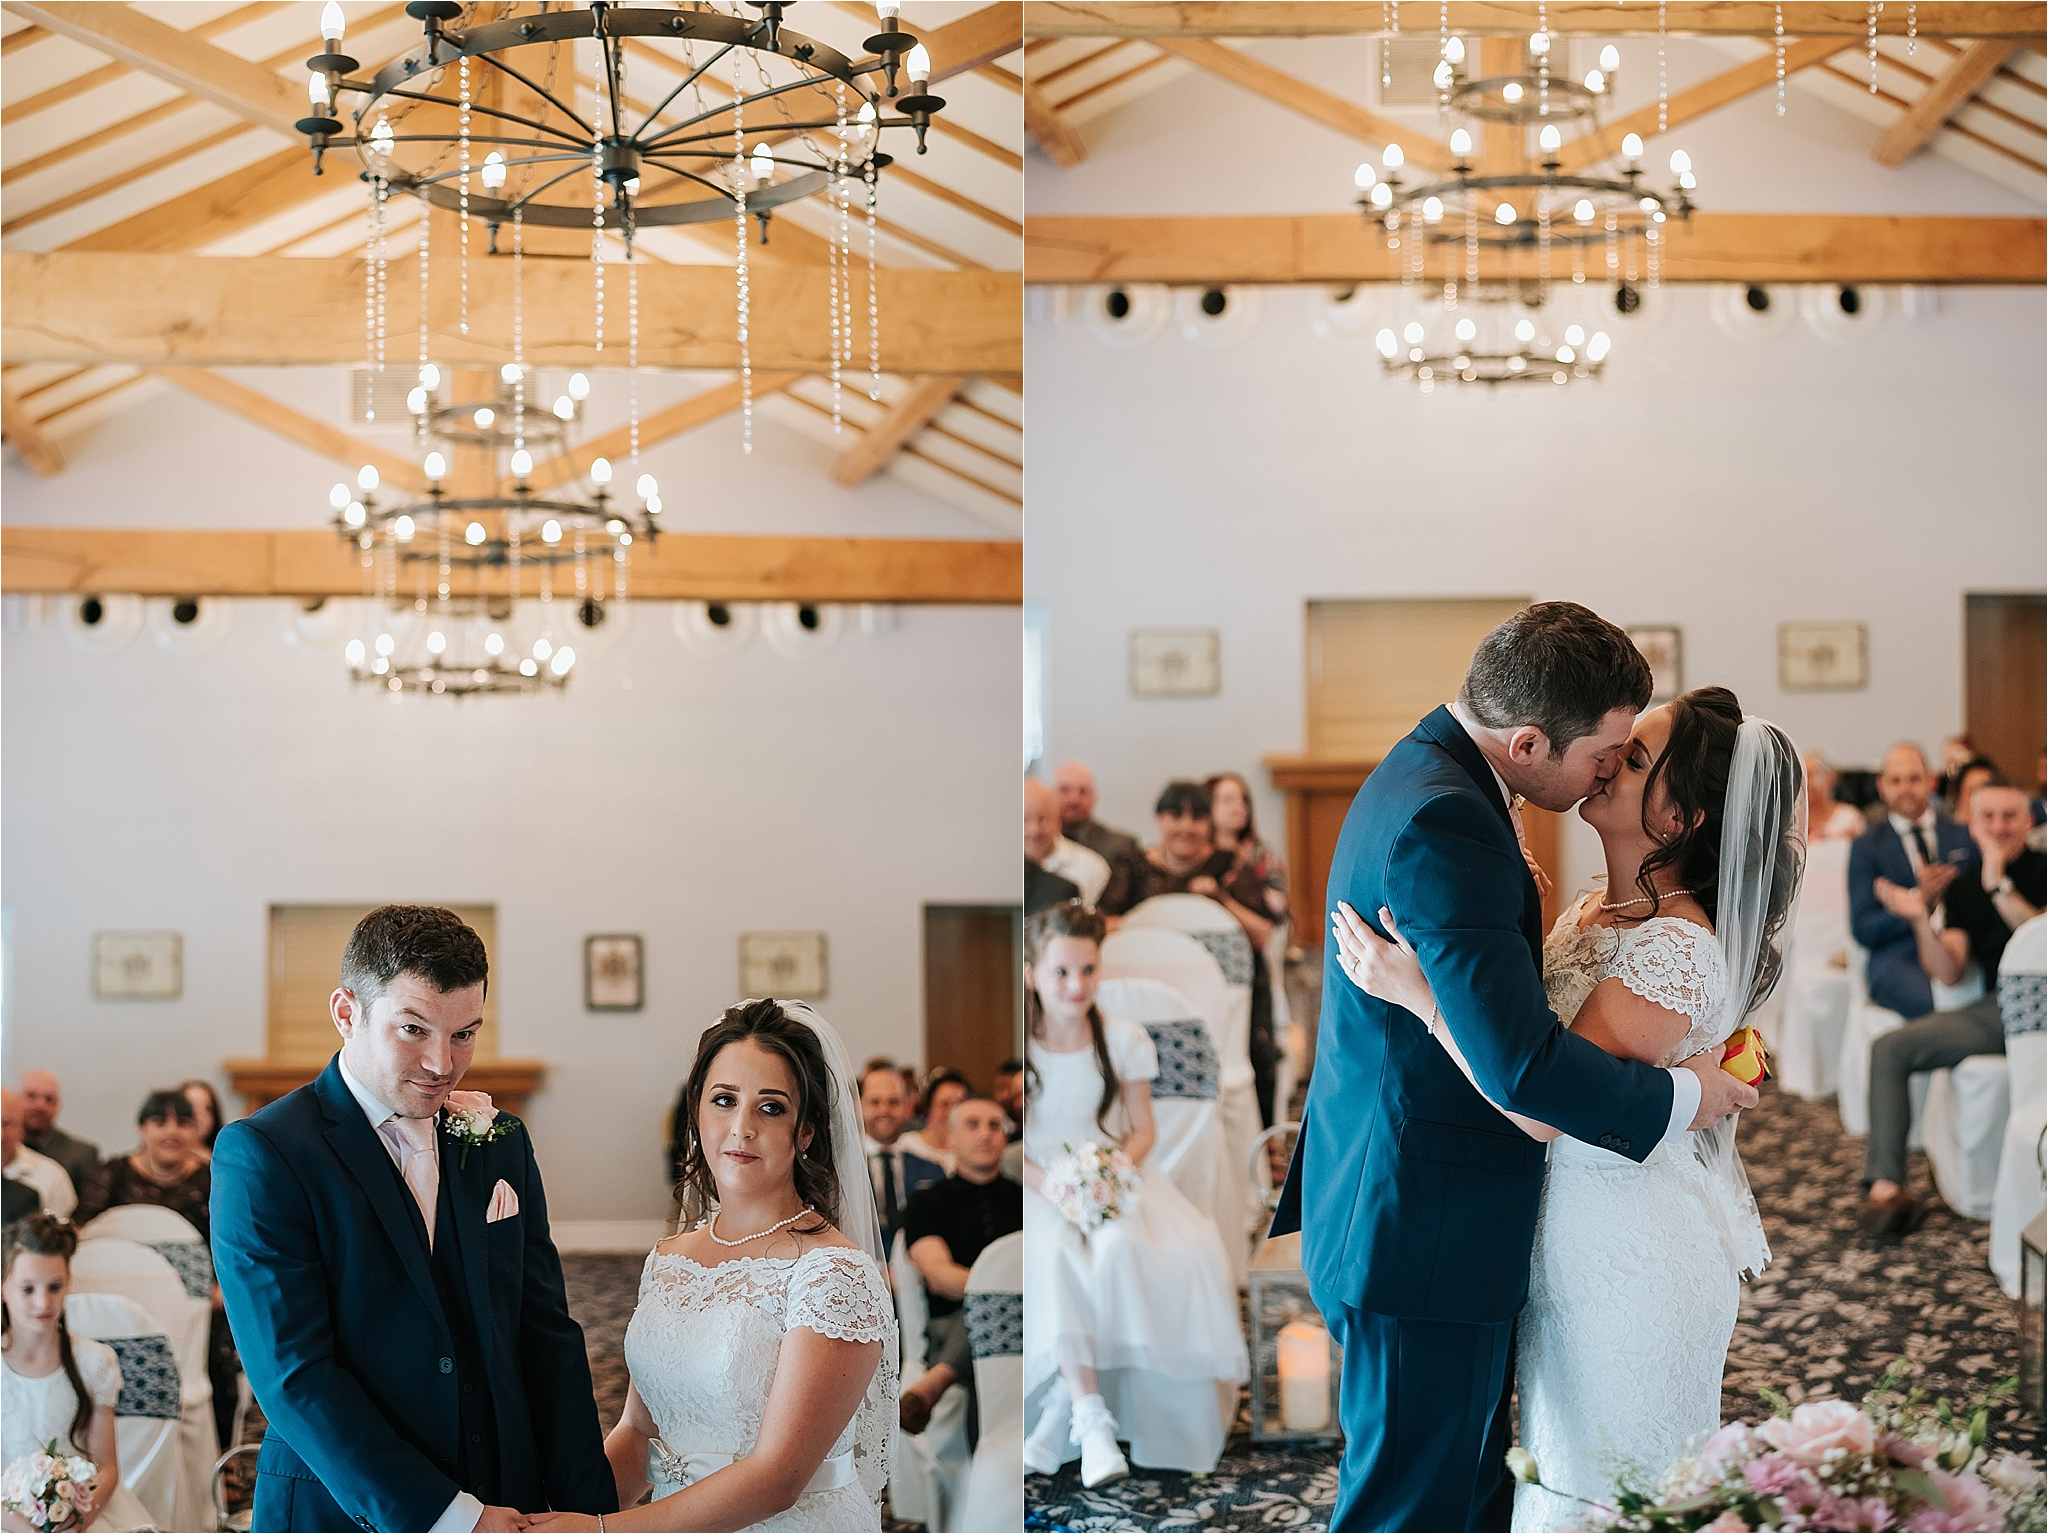 thevilla+lancashire+wreagreen+wedding+photographer31.jpg